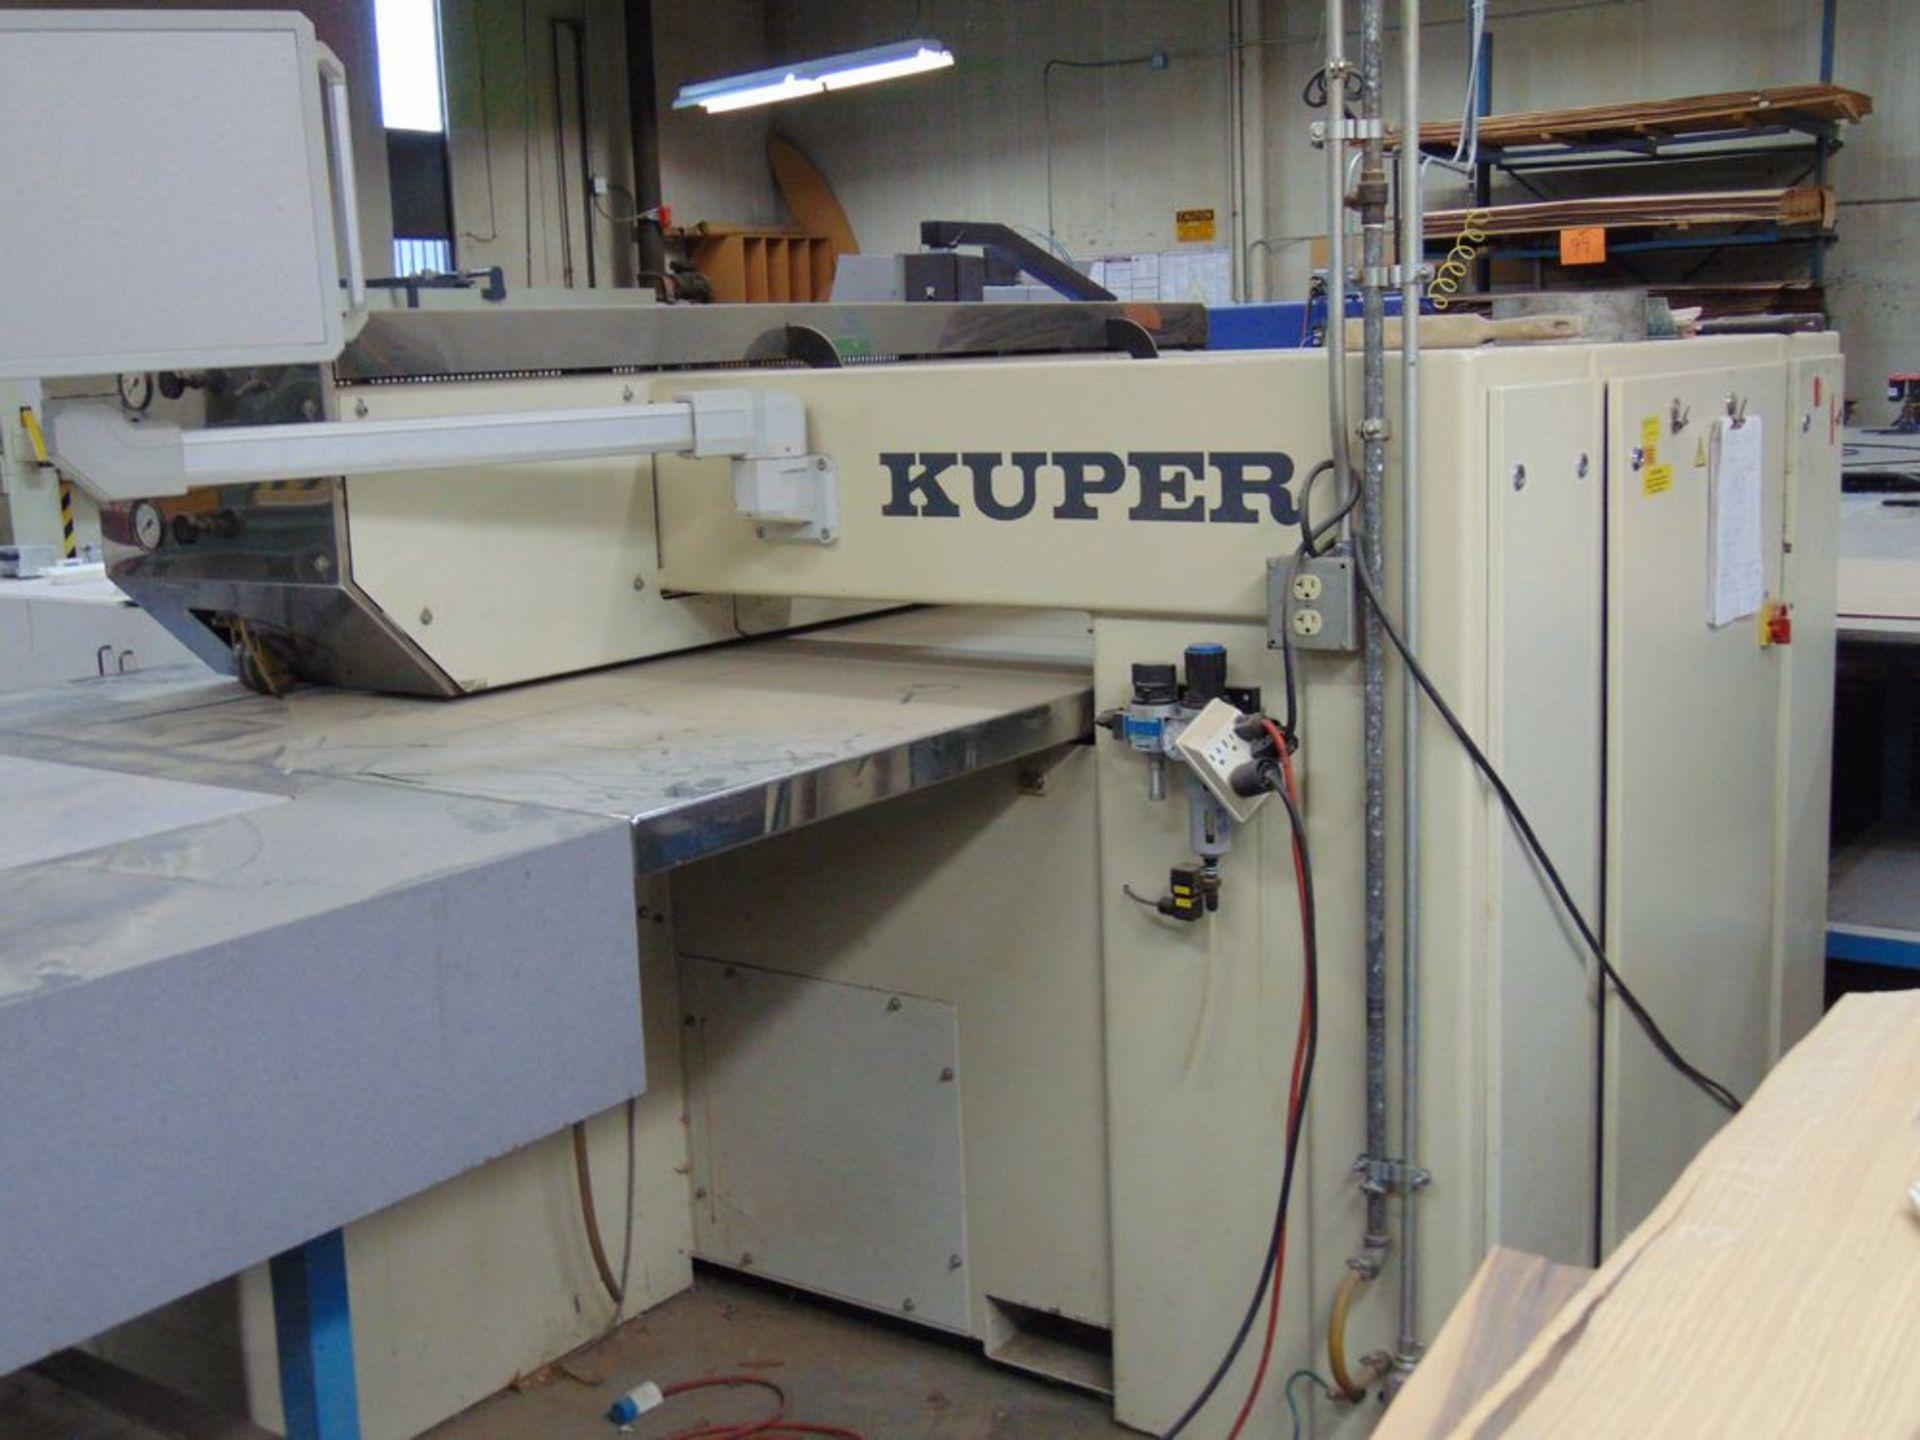 (1999) Kuper Type FCI Mach. No. 3908/0113 Veneer Splicing Machine w/ 54'' x 102''L Light Table; S/ - Image 3 of 7